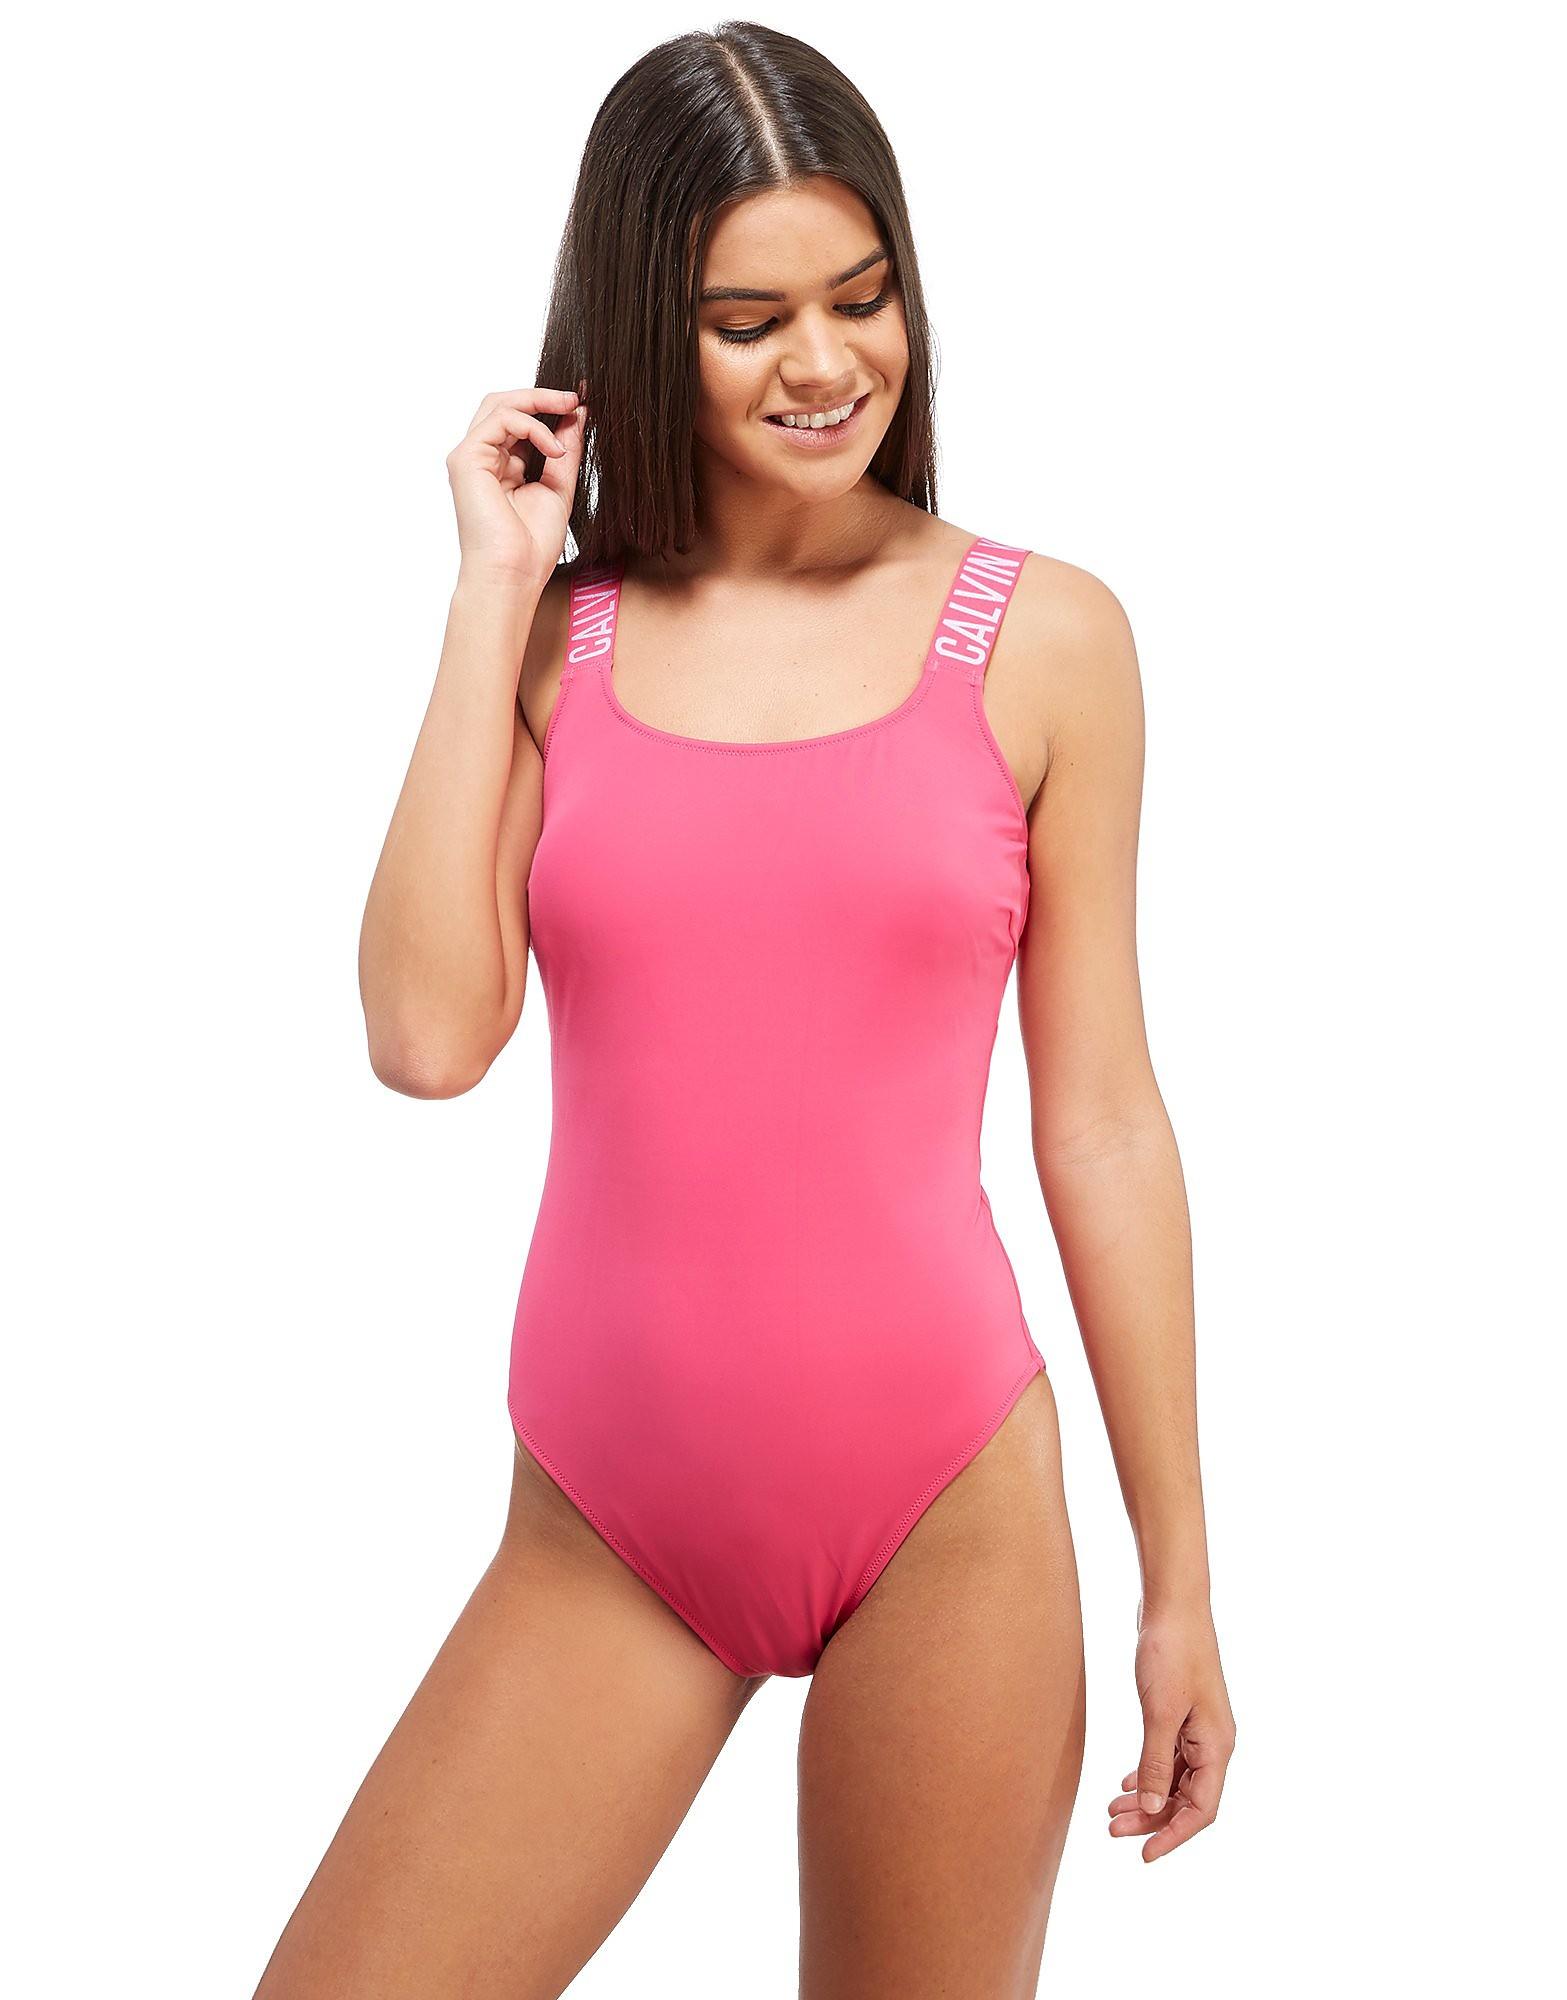 Calvin Klein Tape 1 Piece Swimsuit